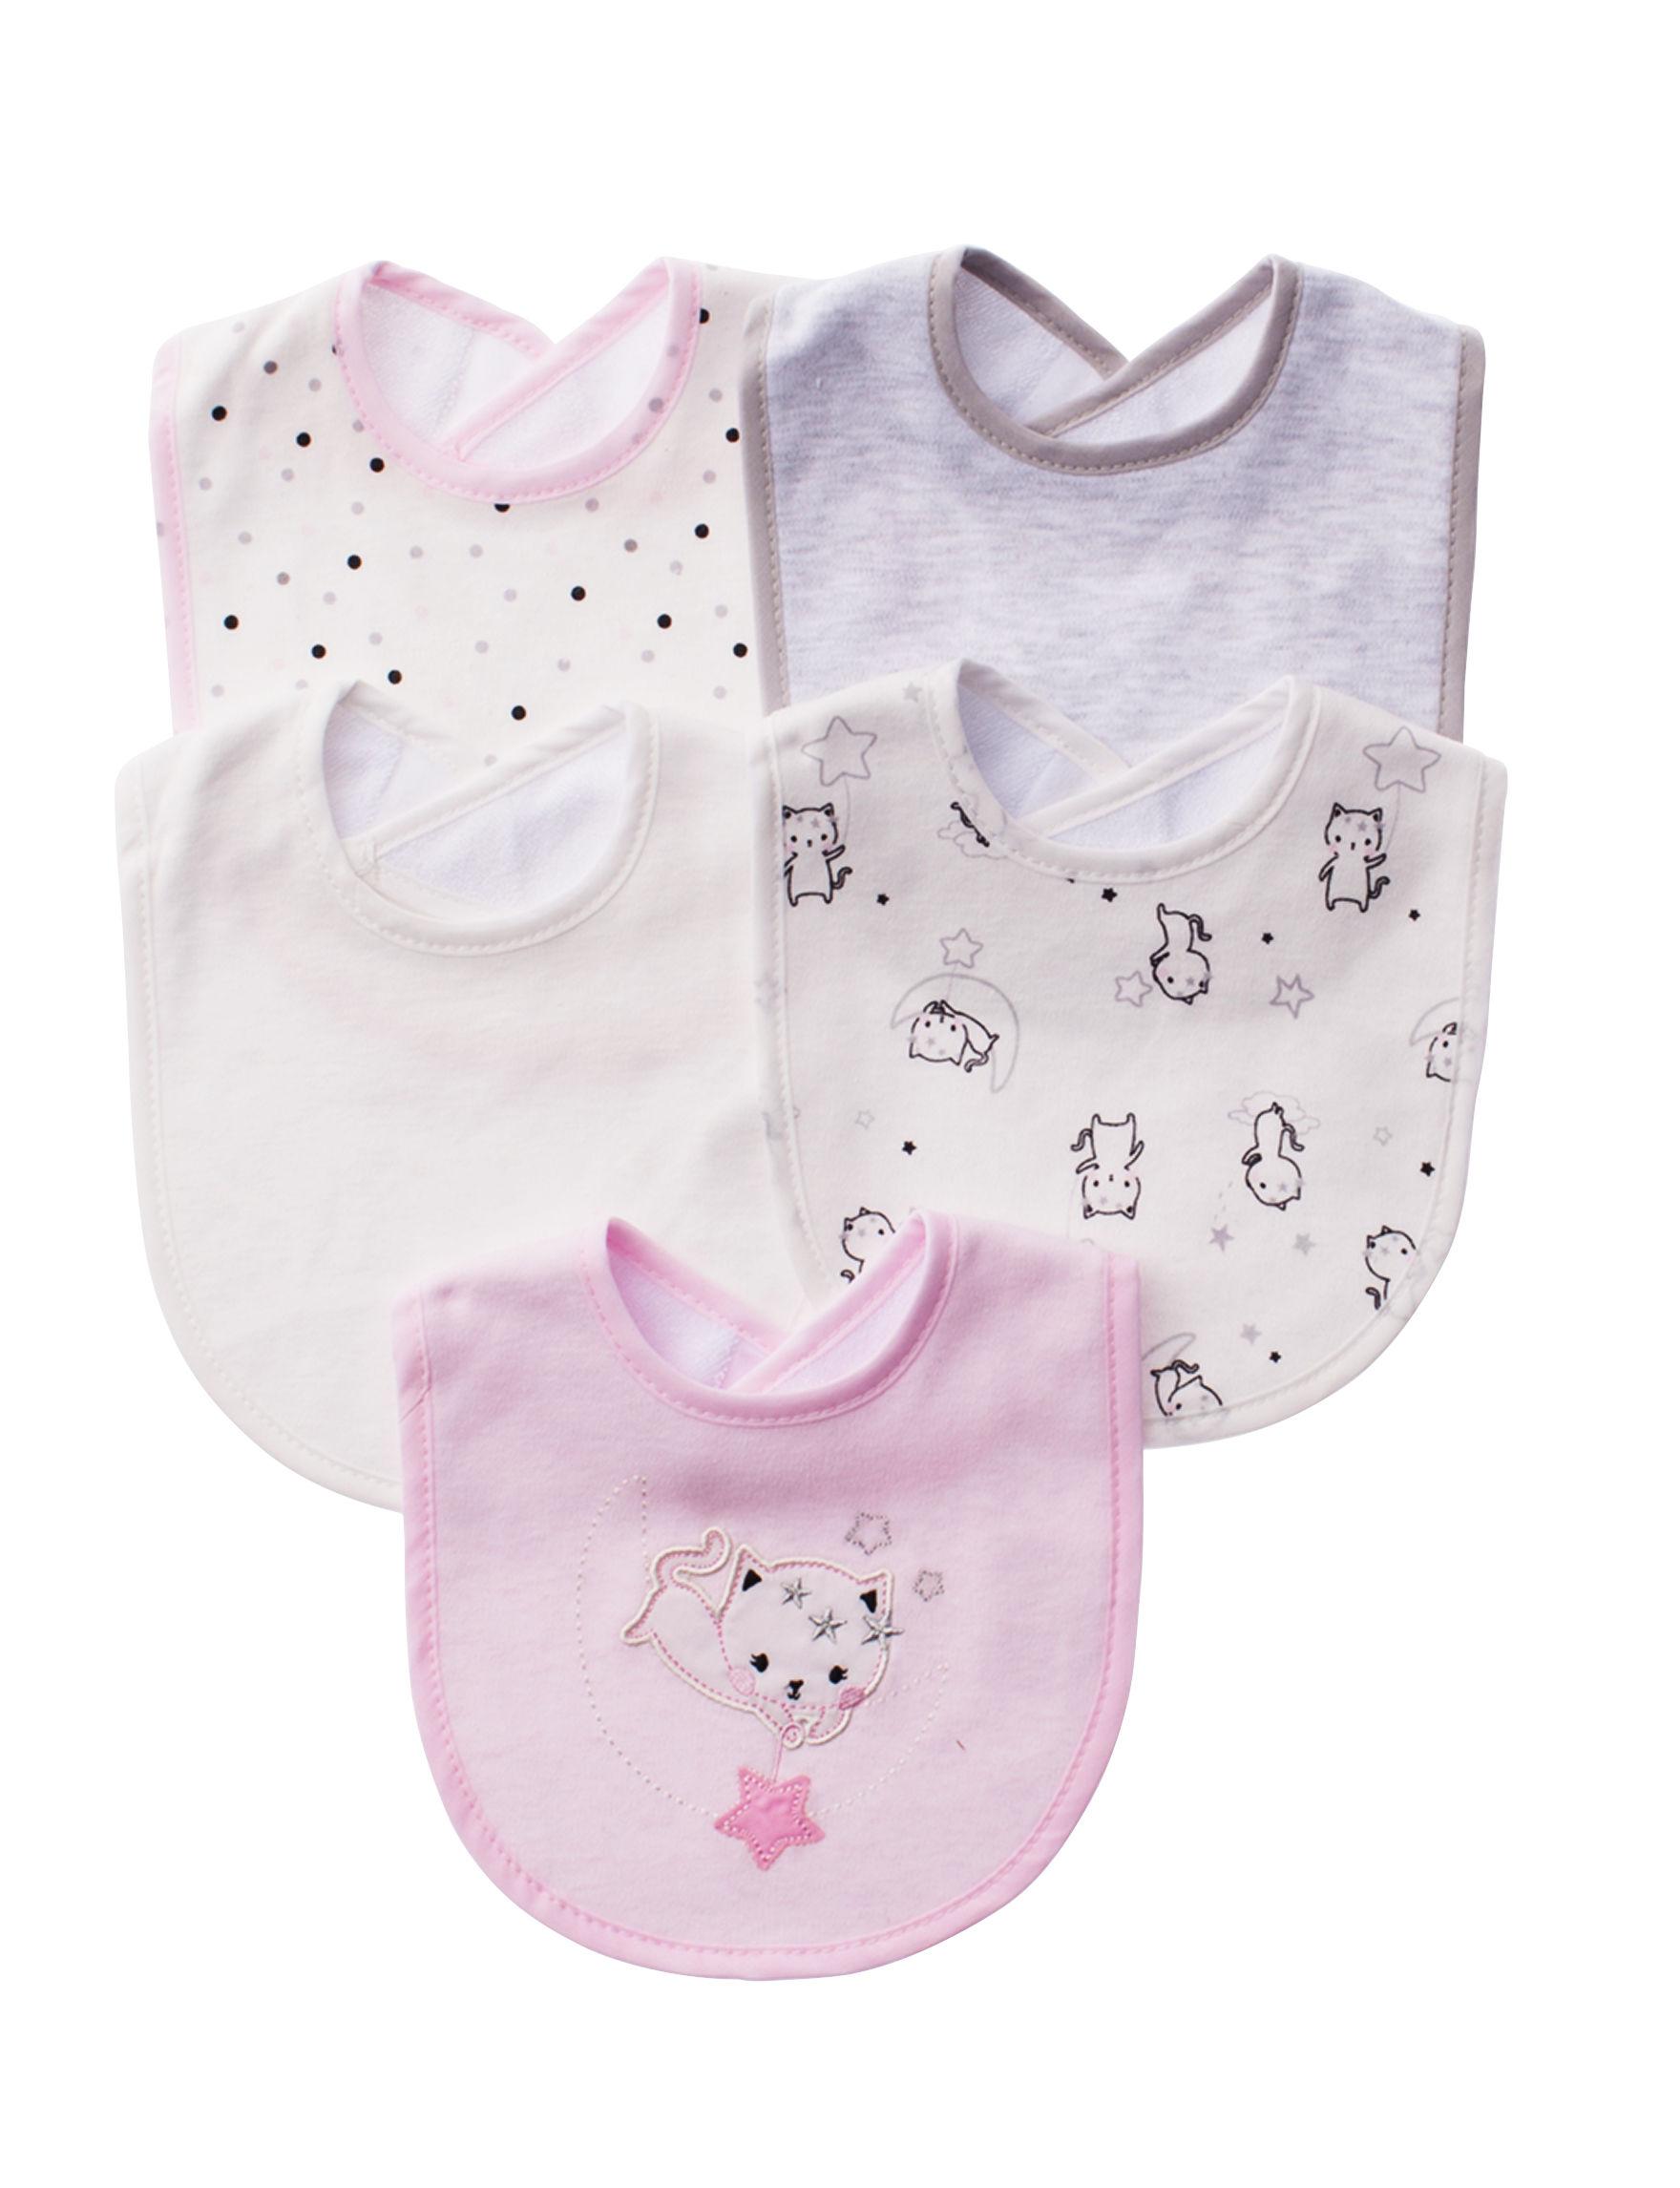 Rene Rofe Pink / White Bibs & Burp Cloths